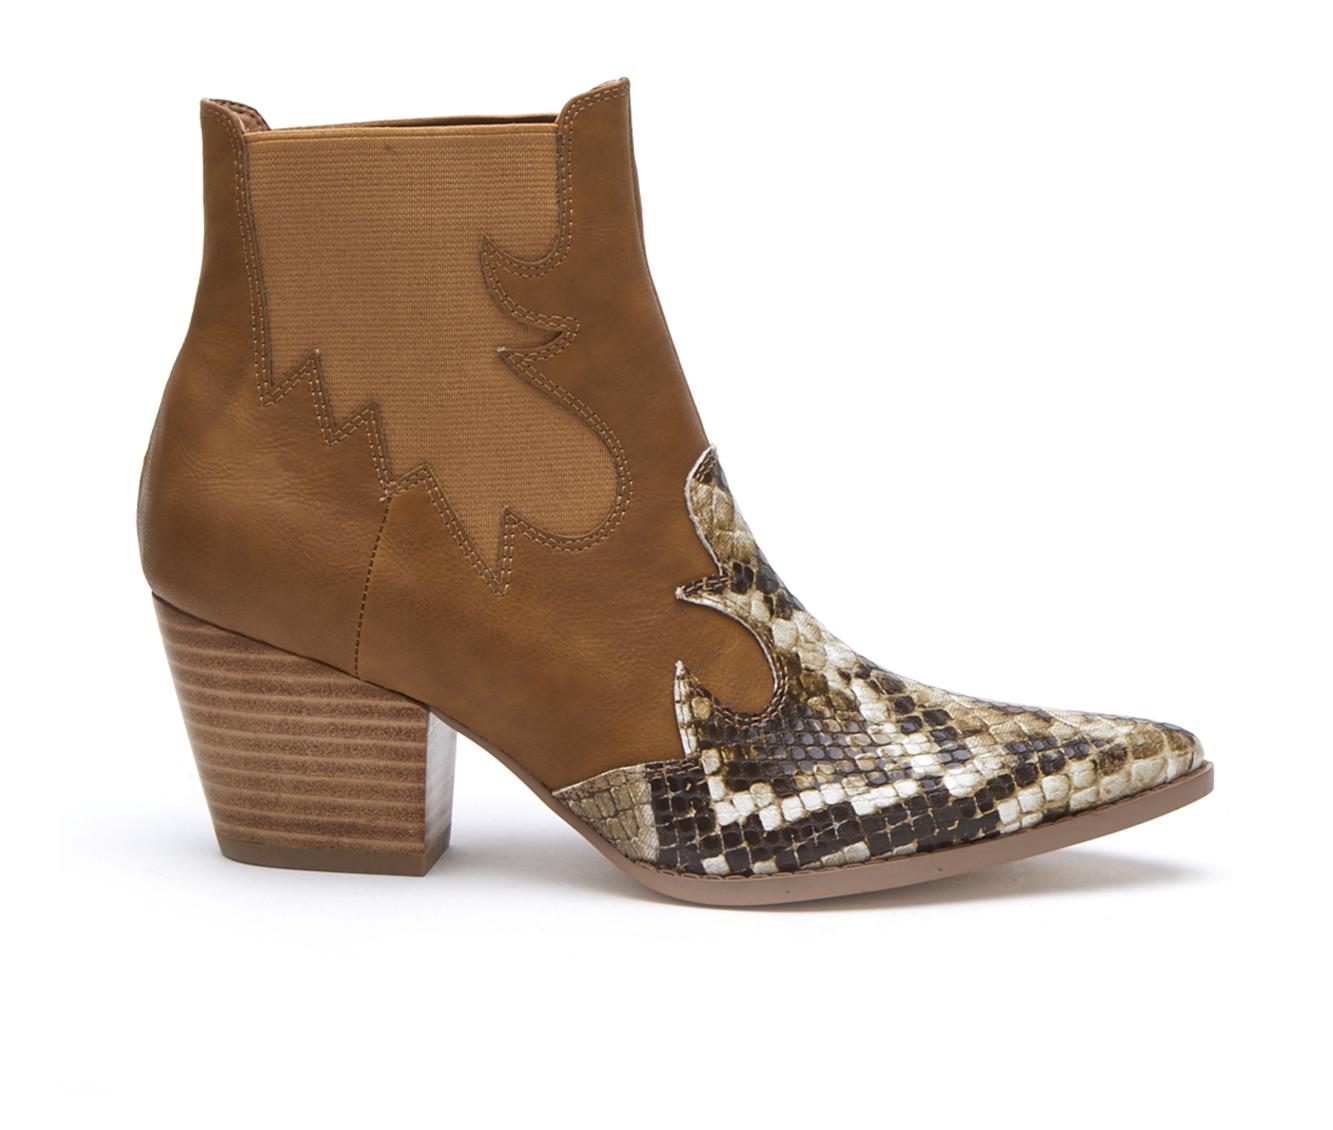 Coconuts Defy Women's Boot (Beige Faux Leather)